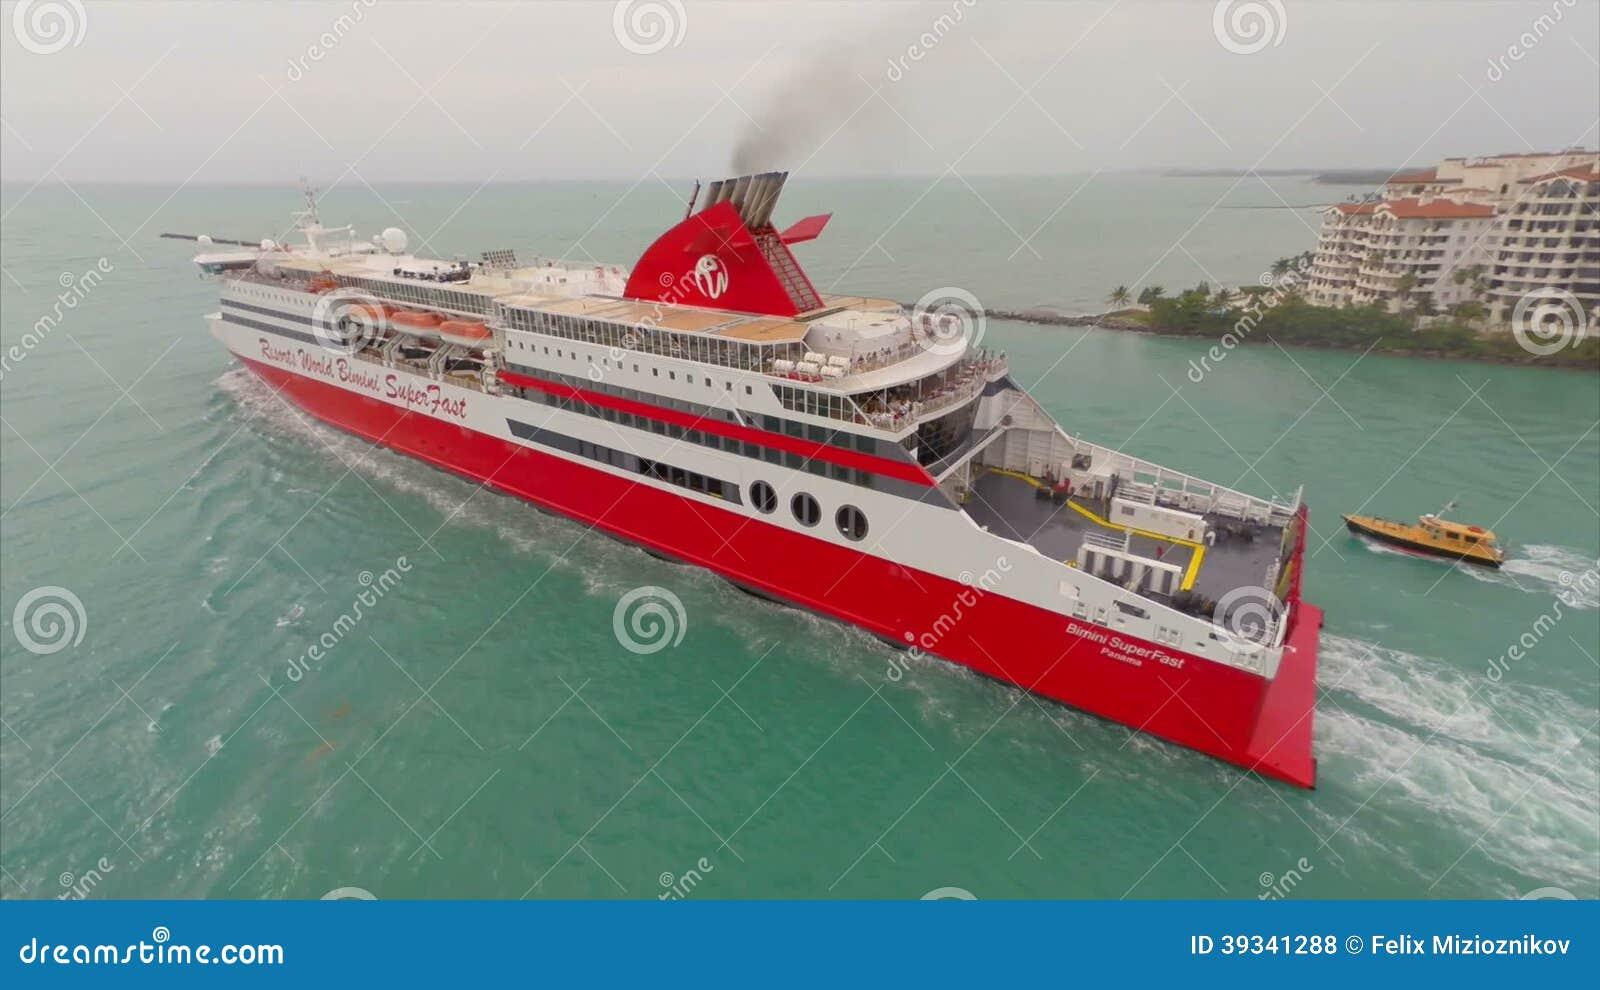 Aerial Bimini Super Fast Cruise Ship Stock Footage Video Of - Bimini superfast cruise ship